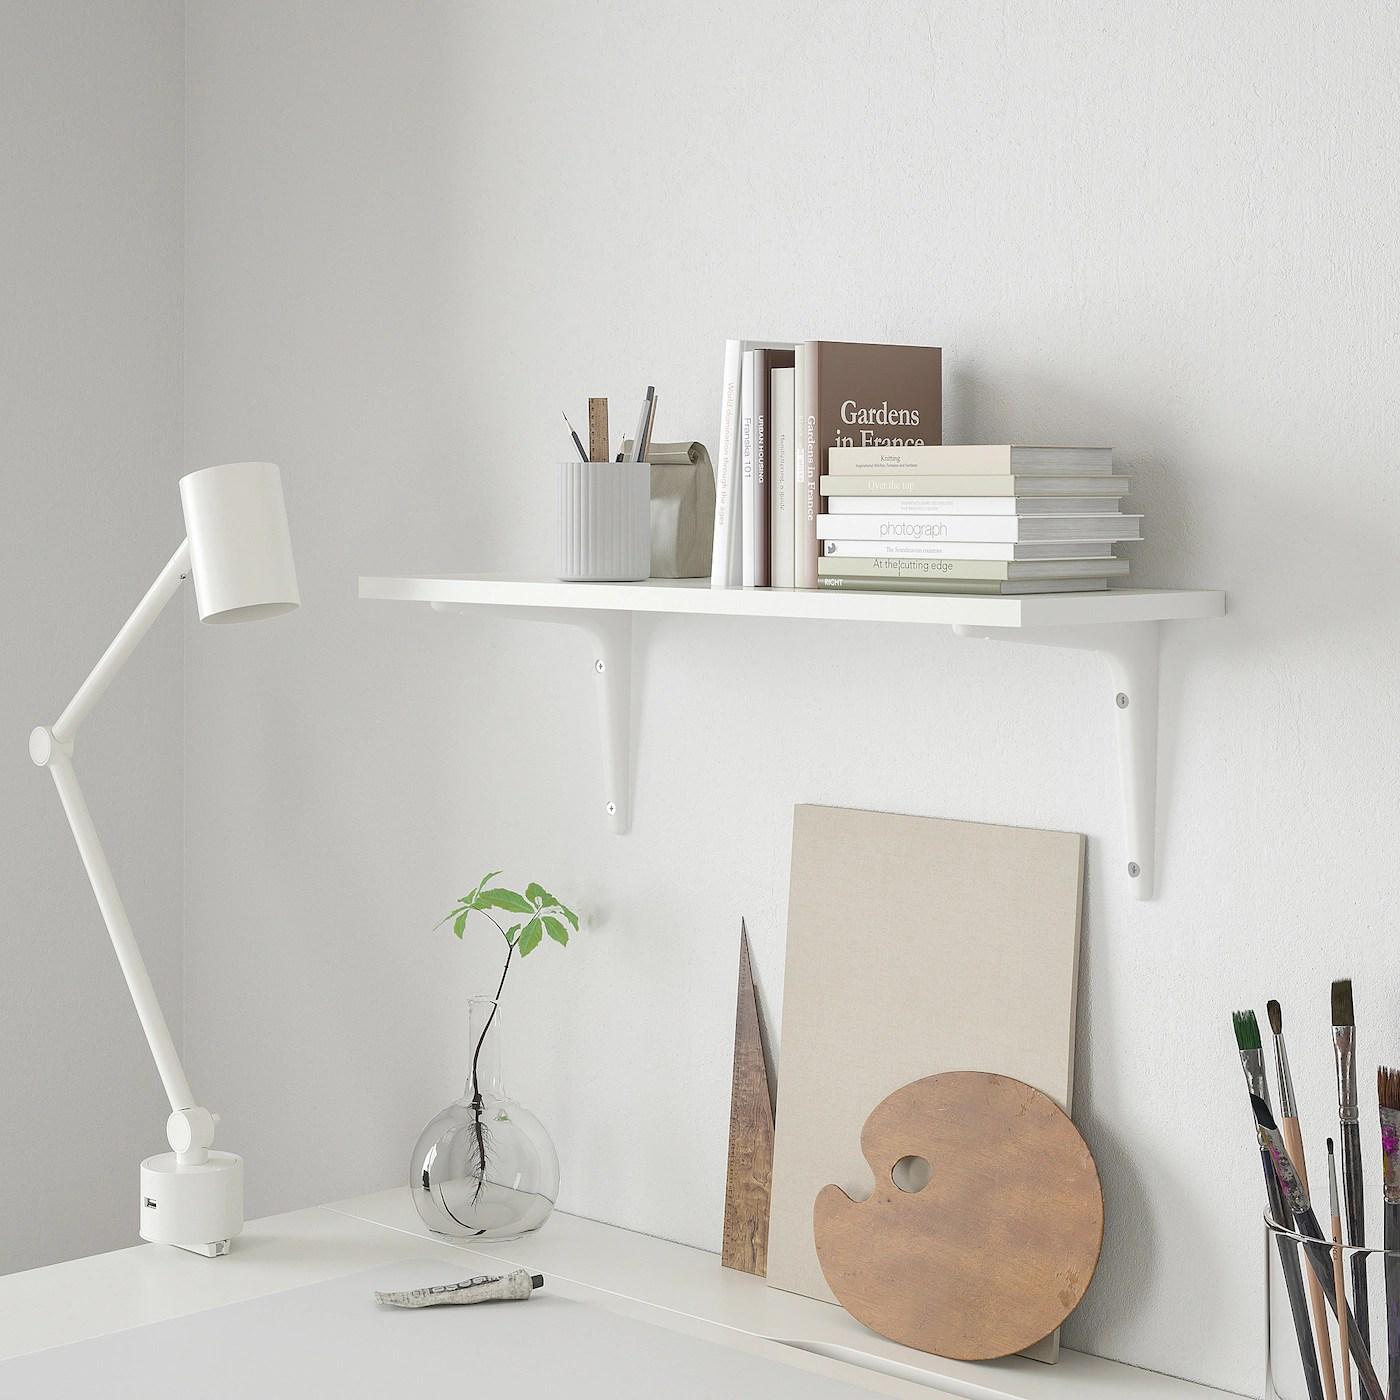 Mensole su misura in plexiglass. Burhult Sibbhult Mensola E Staffe Bianco Bianco Ikea Svizzera